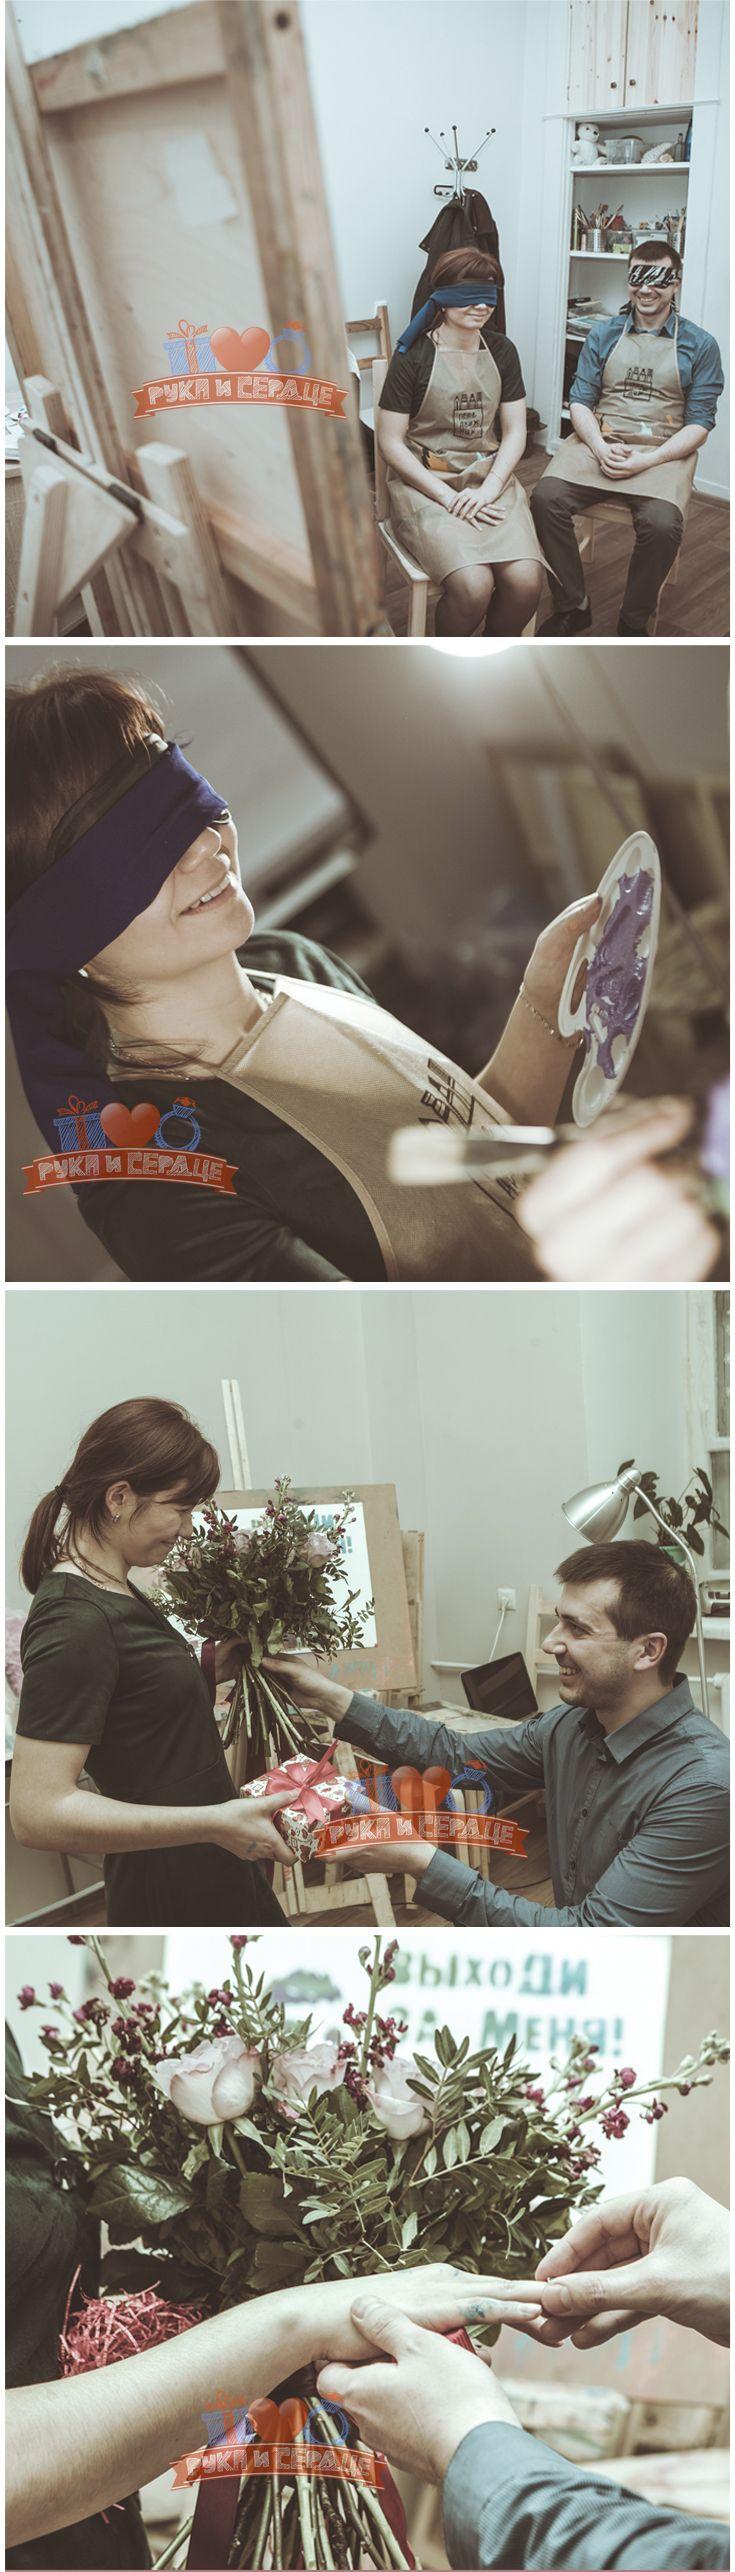 Valentin&Nastya Необычное предложение в Москве, предложение-сюрприз/ Marriage proposal #rukaiserdce #рукаисердце #свидание #предложение #date #proposal #engagement #surprise #romantic #gift #романтика